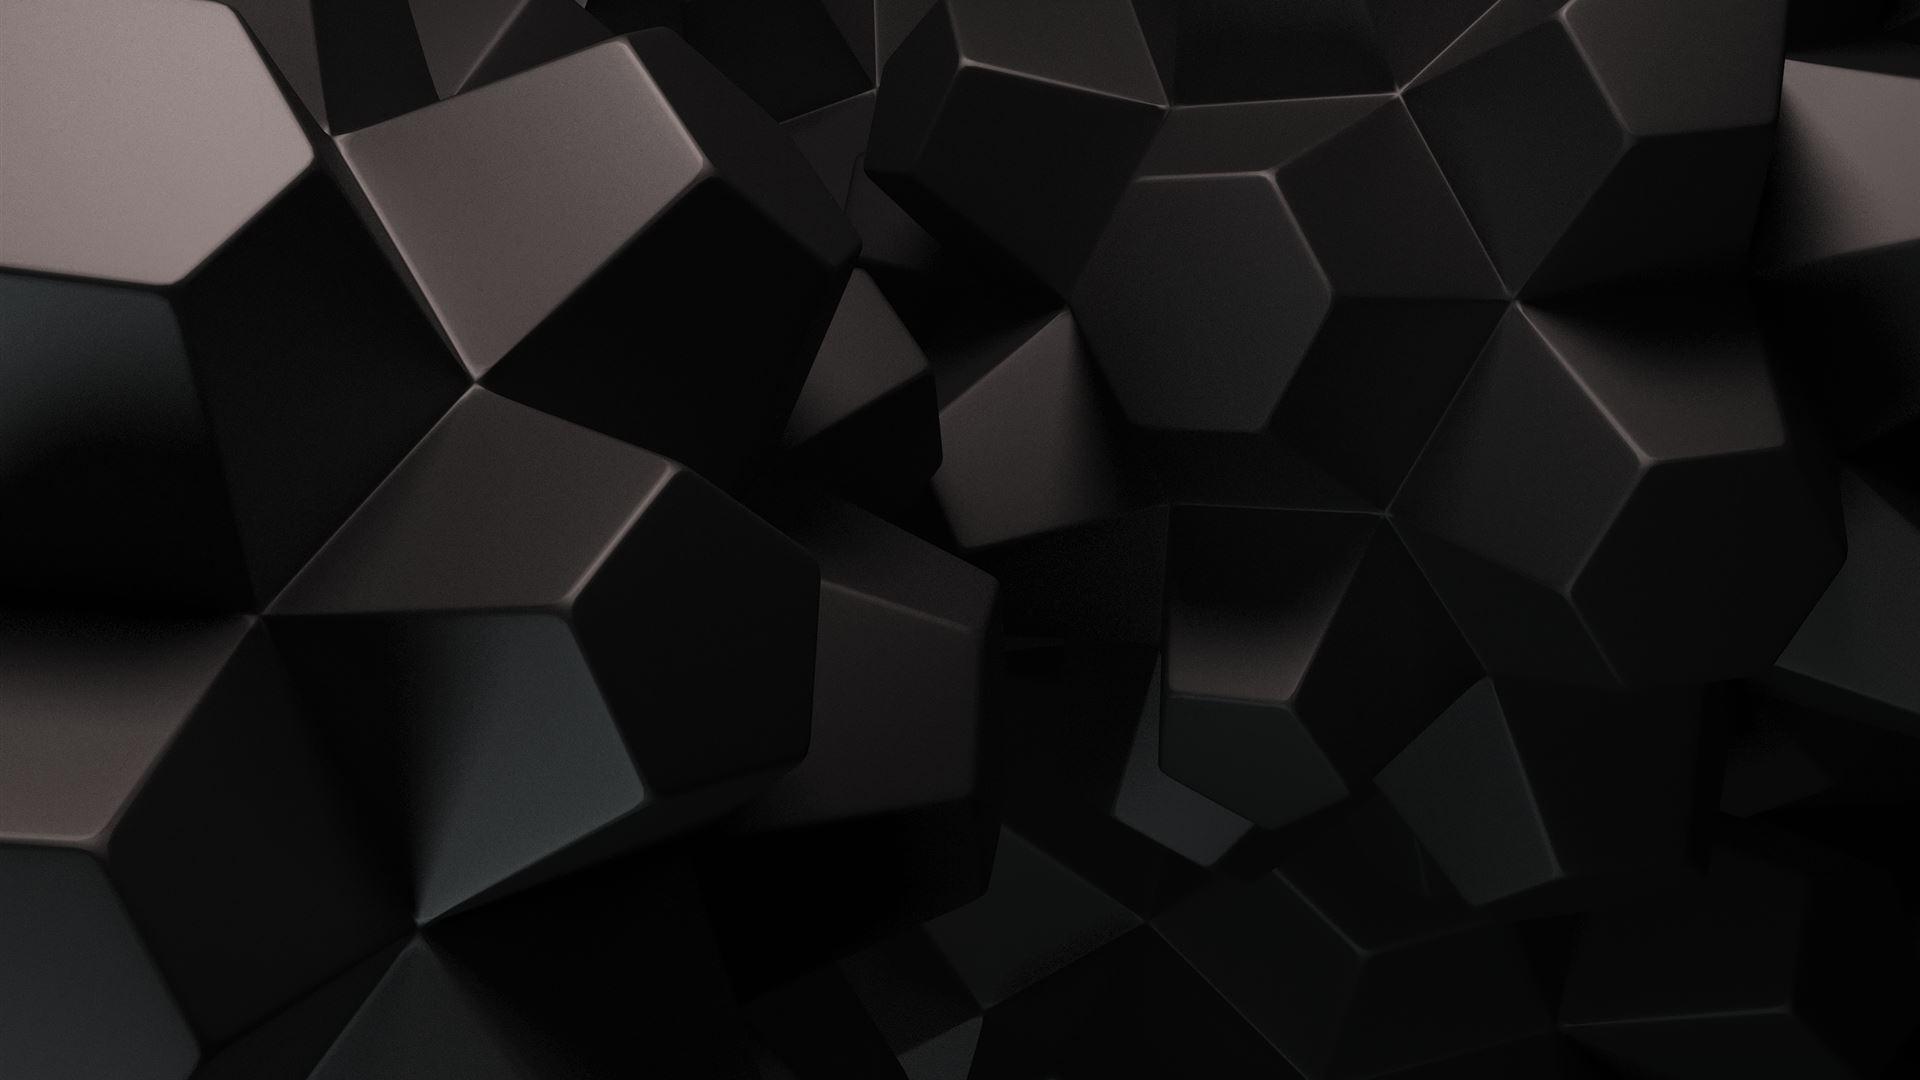 geometric shapes 3d mac wallpaper download free mac wallpapers